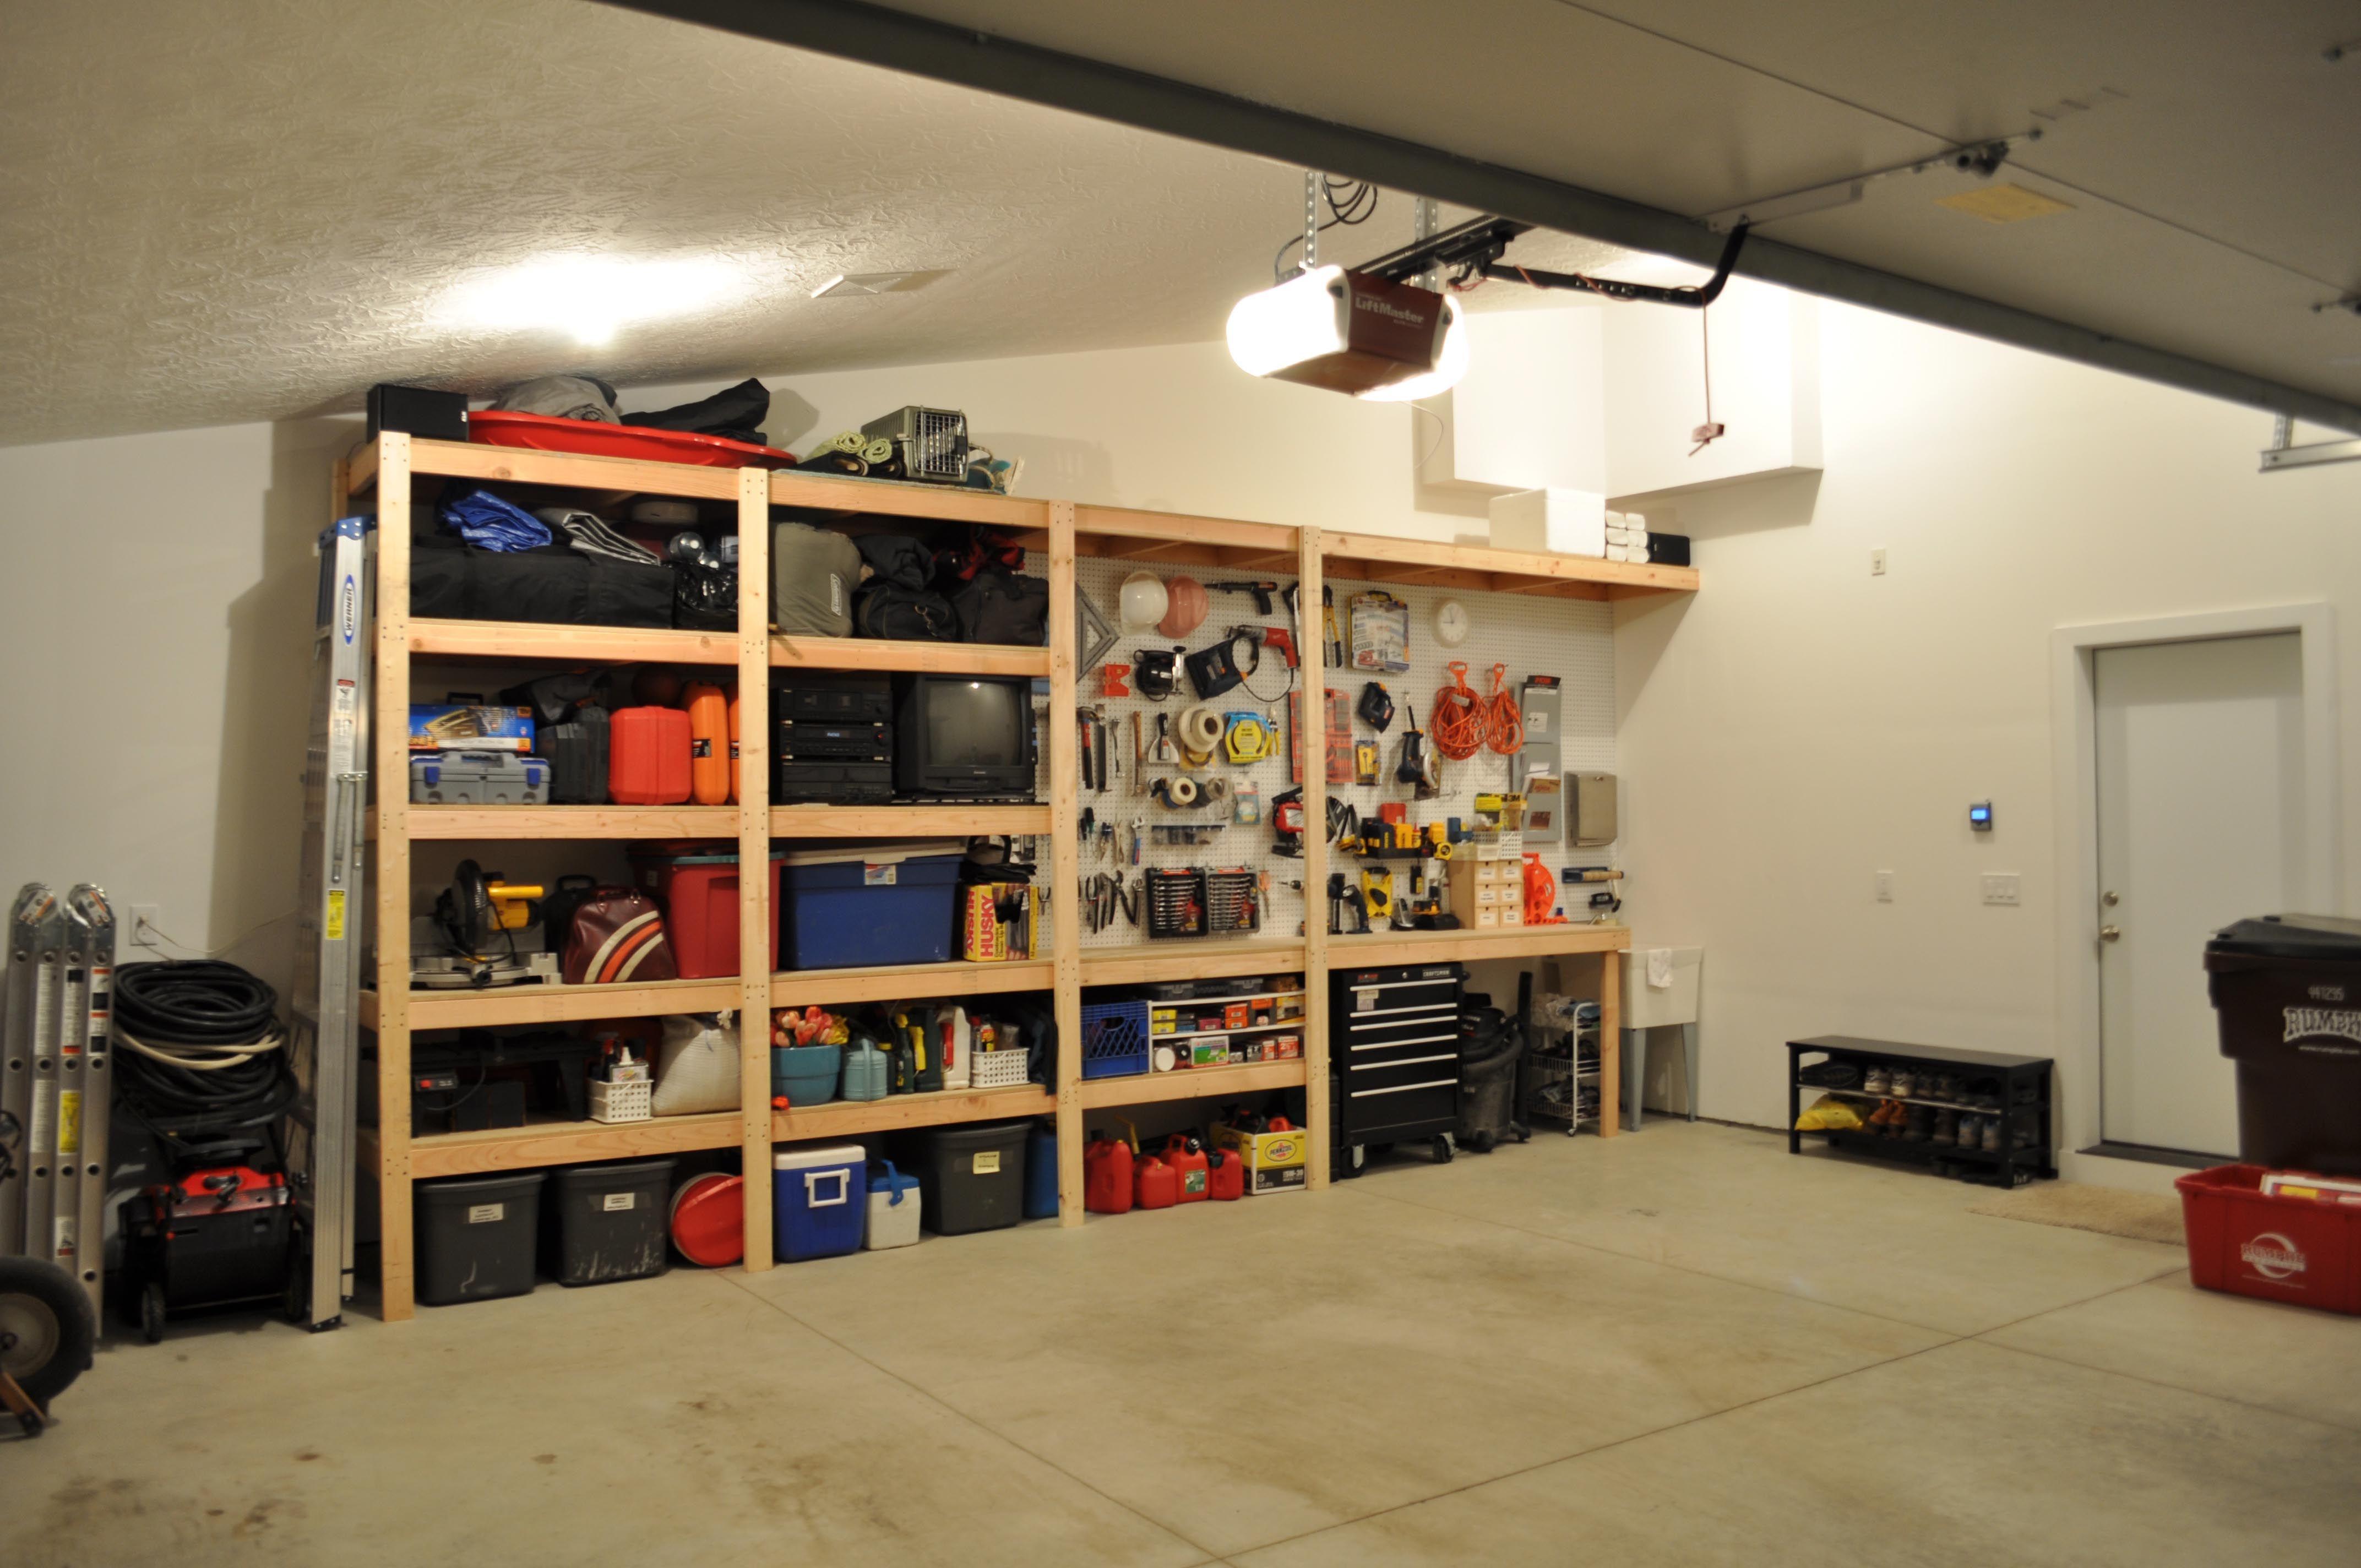 Pdf Plans Storage Shelf Building Ideas Download Free Simple Wood Clock Plans Garage Wall Storage Diy Garage Storage Garage Shelving